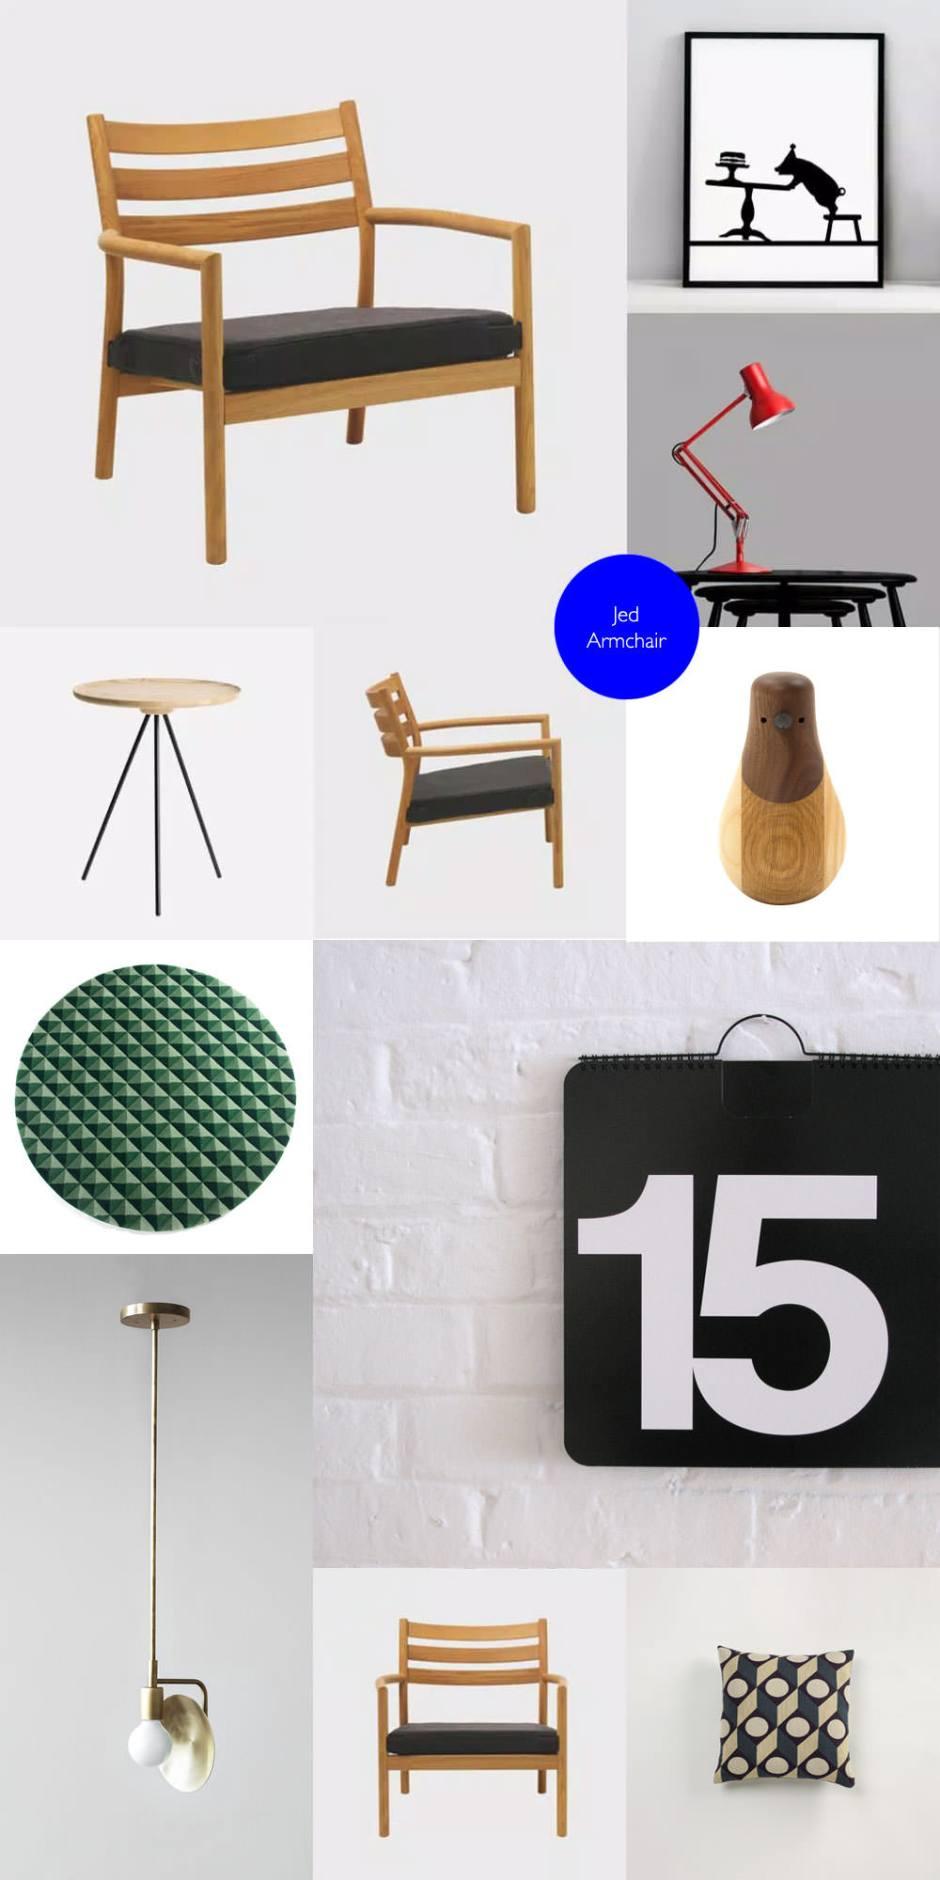 jed-armchair-habitat-david-irwin-montage